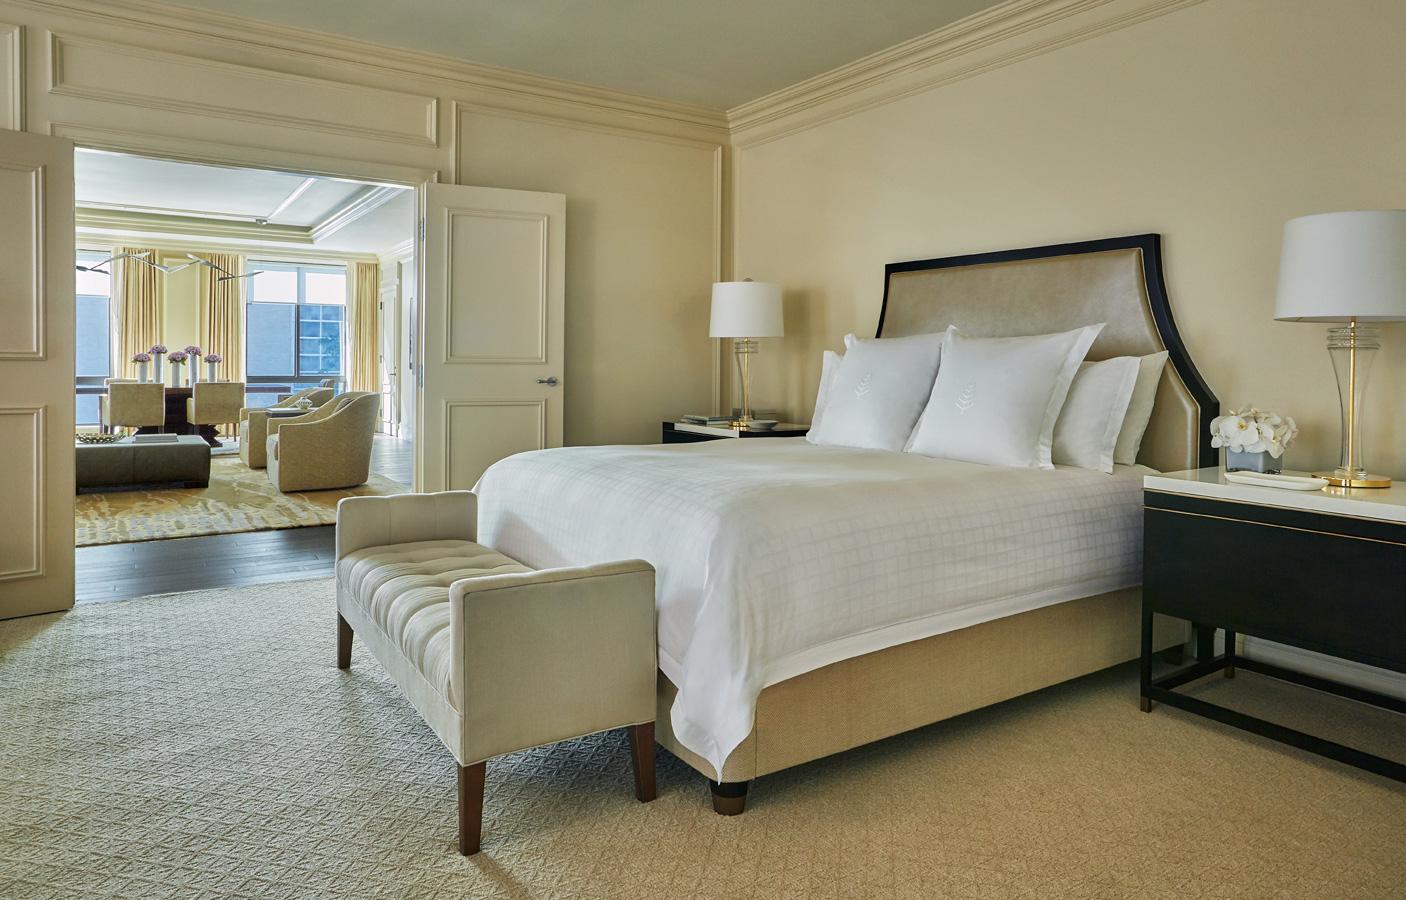 Four Seasons hotel guest suite in Washington, DC